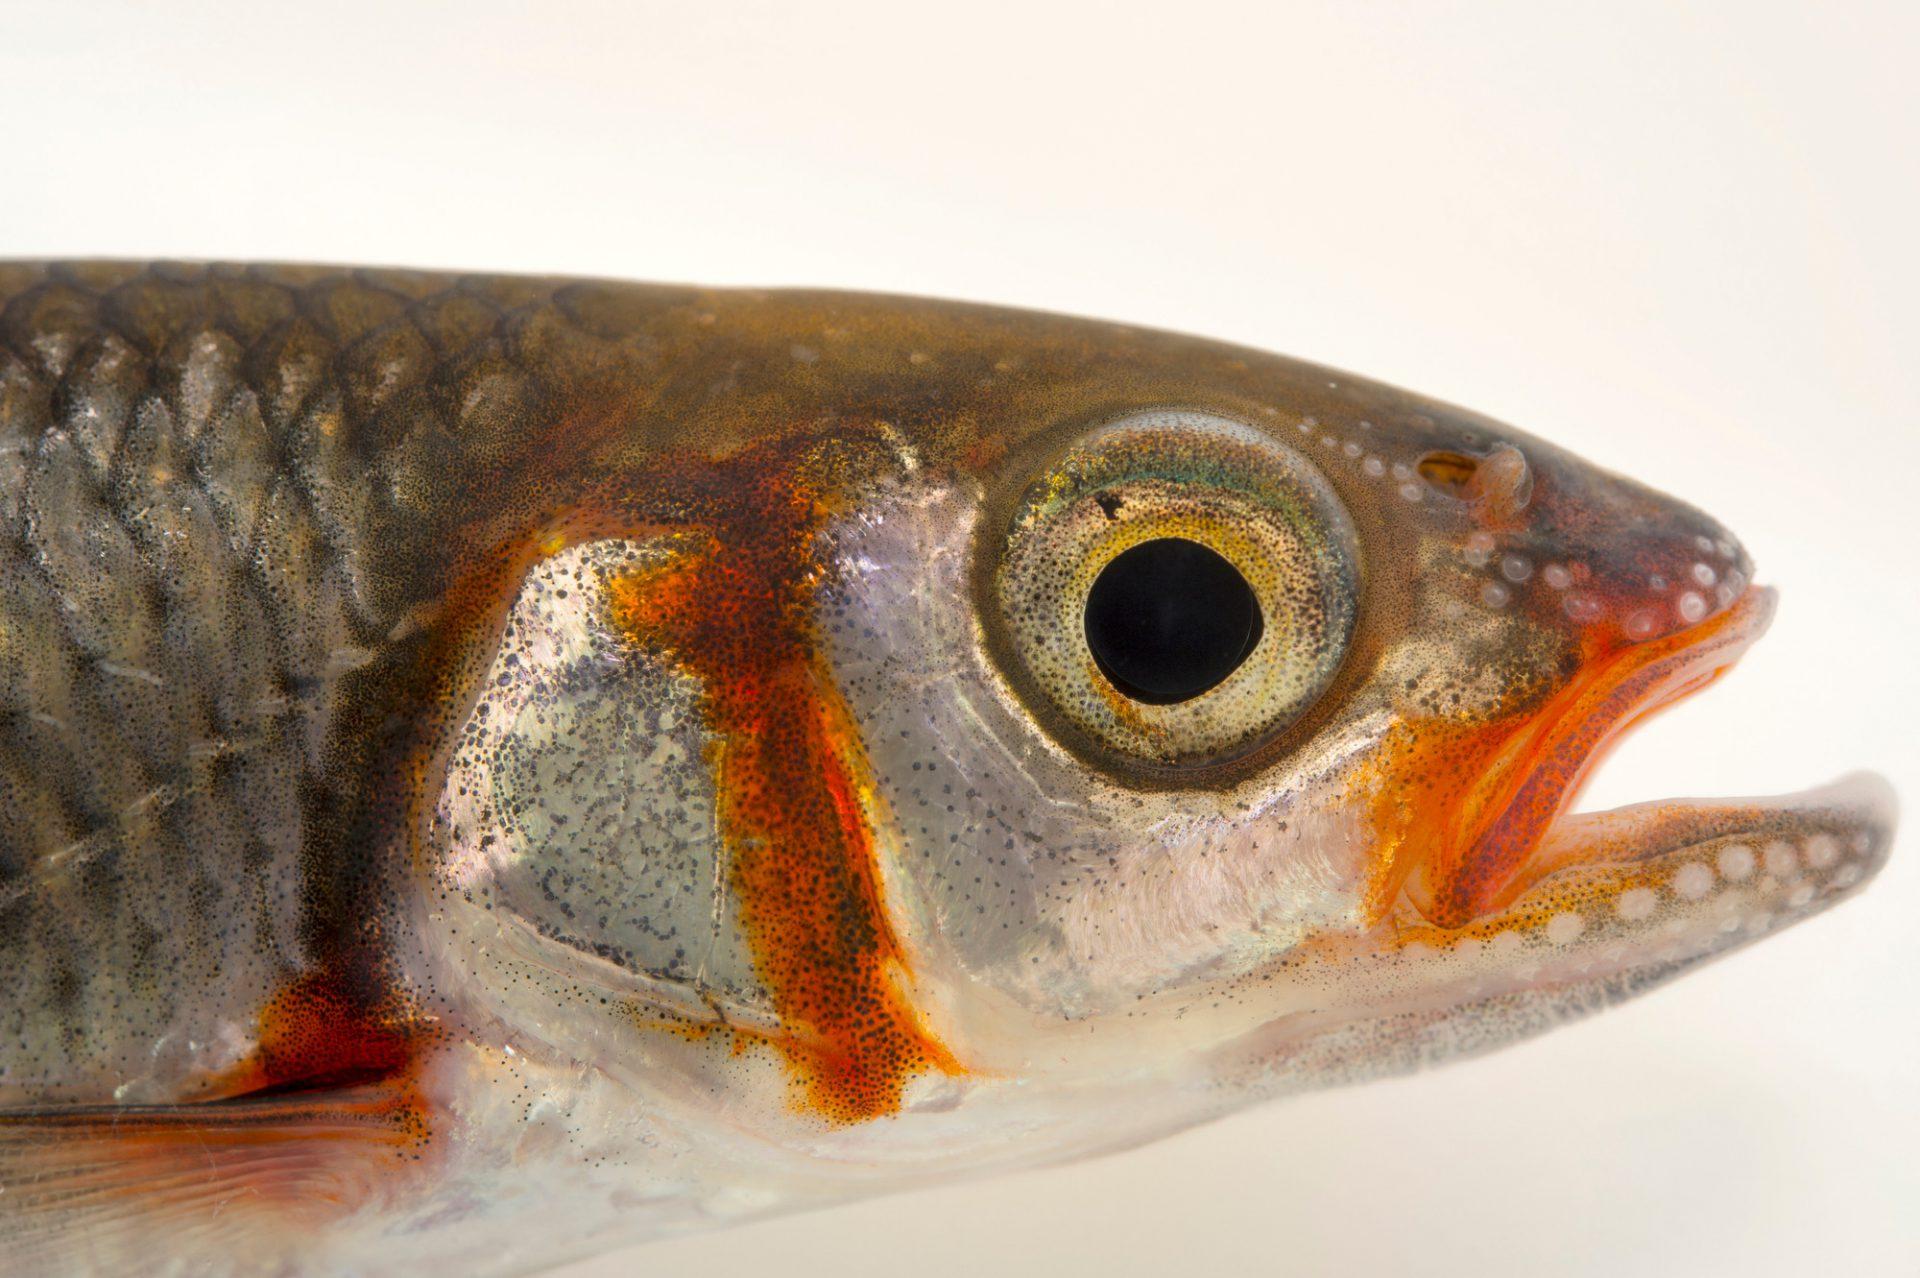 Picture of a warpaint shiner (Luxilus coccogenis) at the Virginia Aquarium.